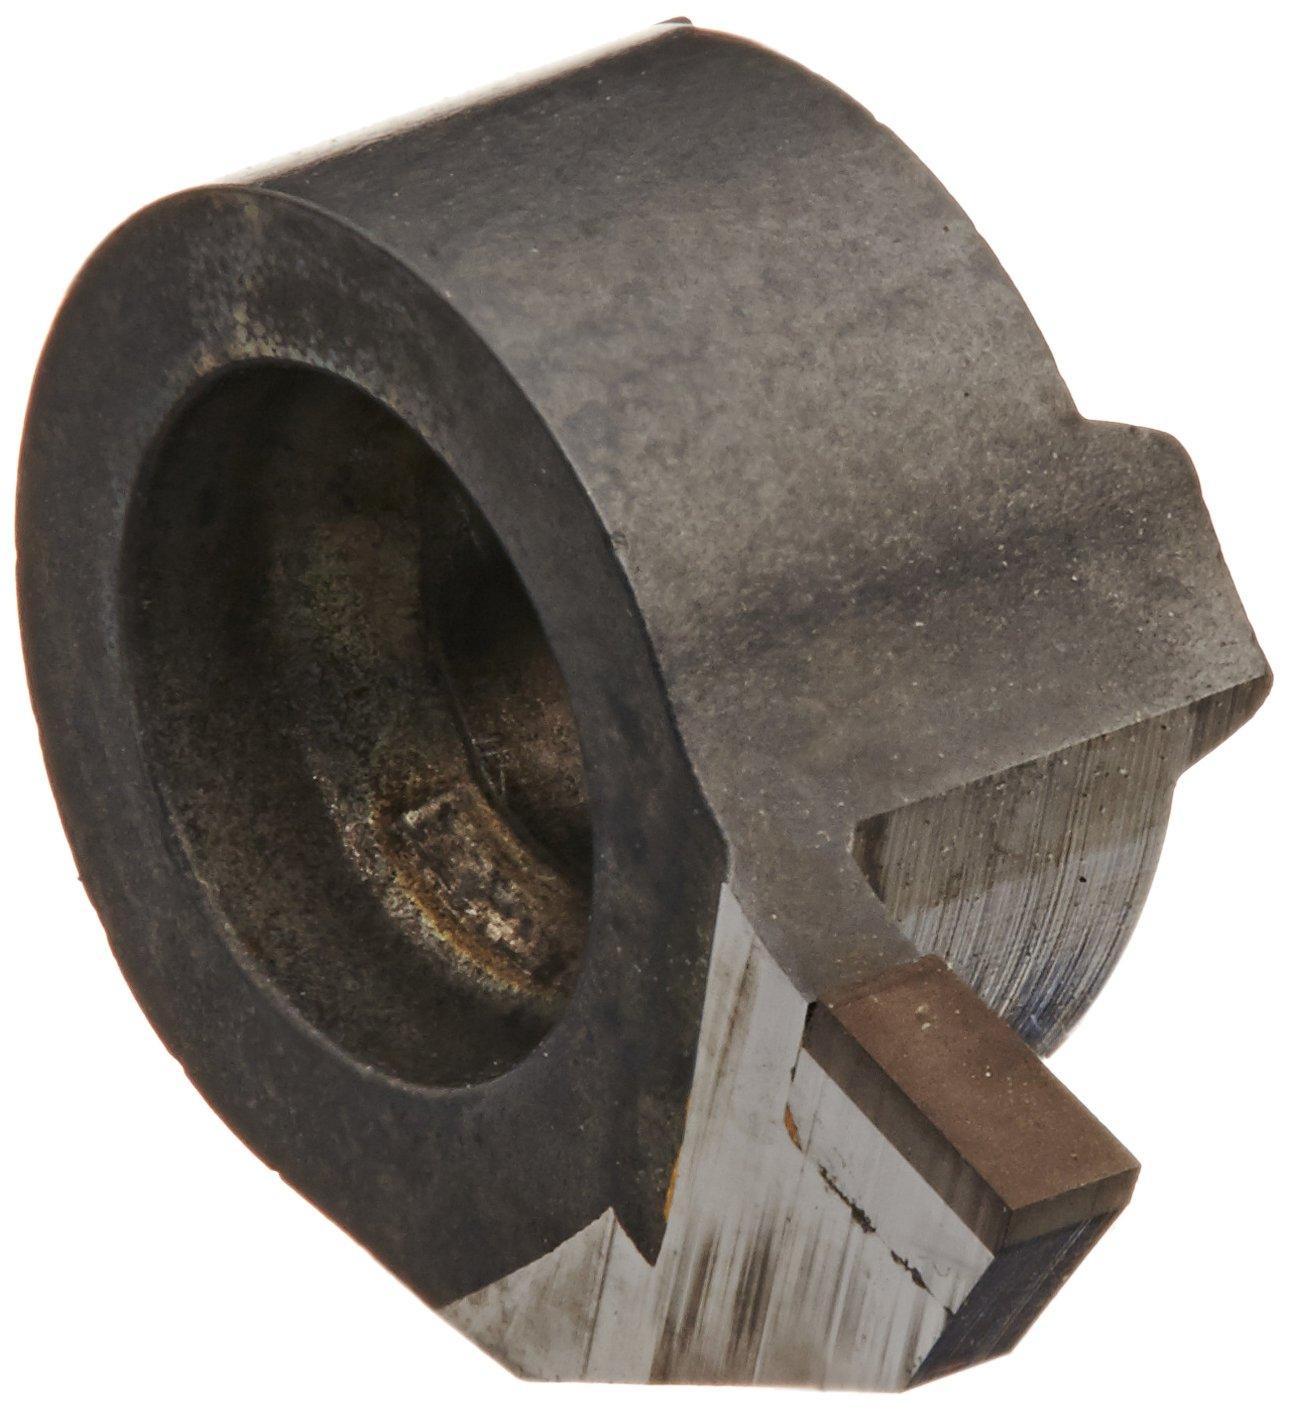 Sandvik Coromant MB-07G100-00-11R CoroCut MB CBN Grooving Insert, CB7015 Grade, TiN Coating, 1 Cutting Edge, Right Hand Orientation, 0.039'' Cutting Width, 0'' Corner Radius, 07 Insert Seat Size (Pack of 5)